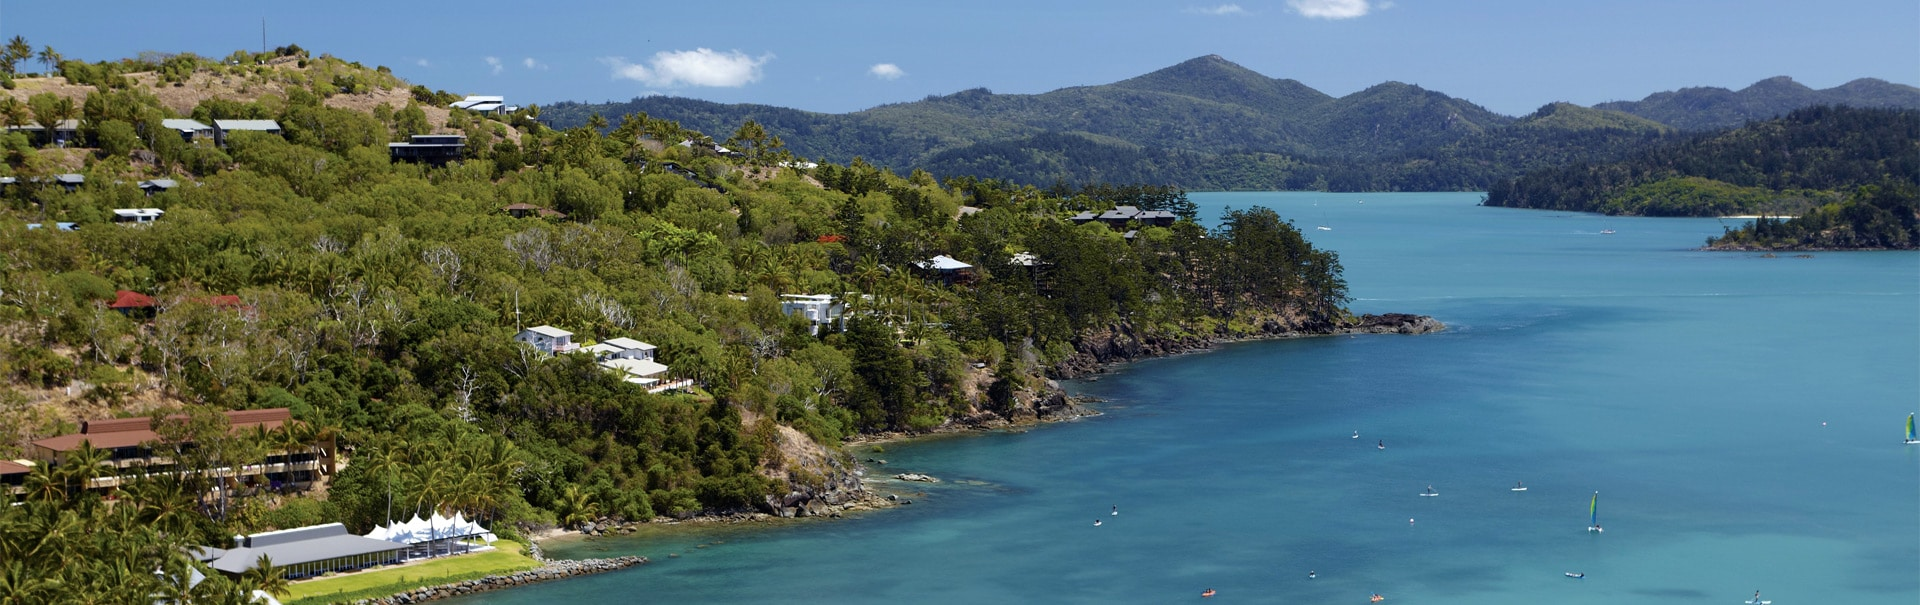 Romantic Hamilton Island (SHAU12) Banner